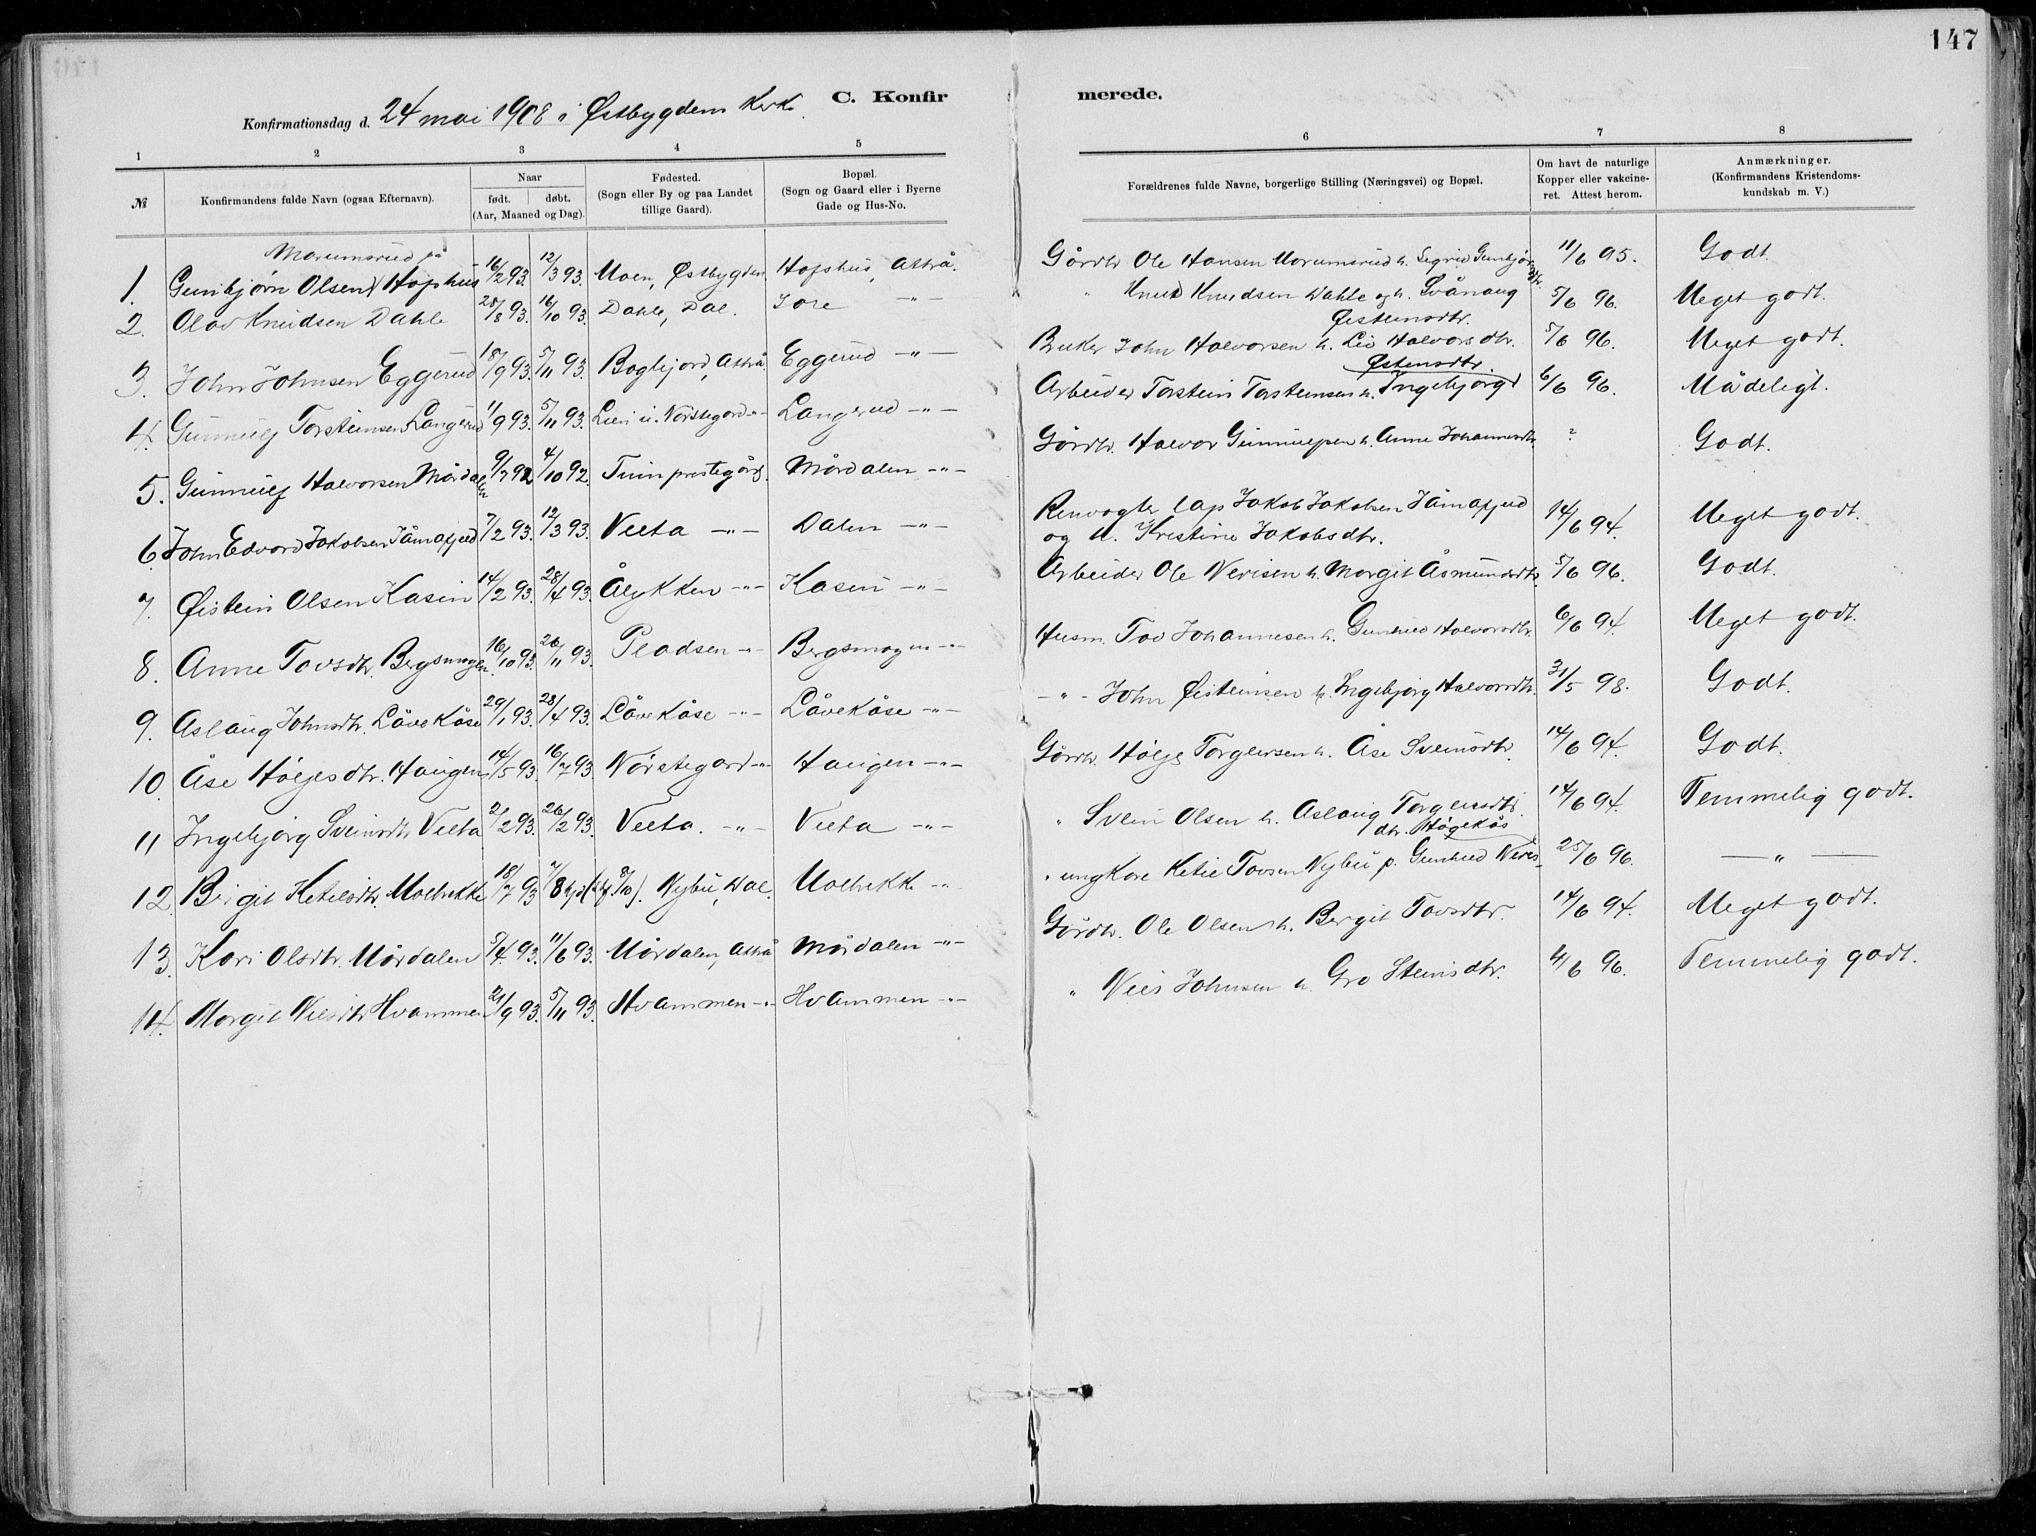 SAKO, Tinn kirkebøker, F/Fa/L0007: Ministerialbok nr. I 7, 1878-1922, s. 147